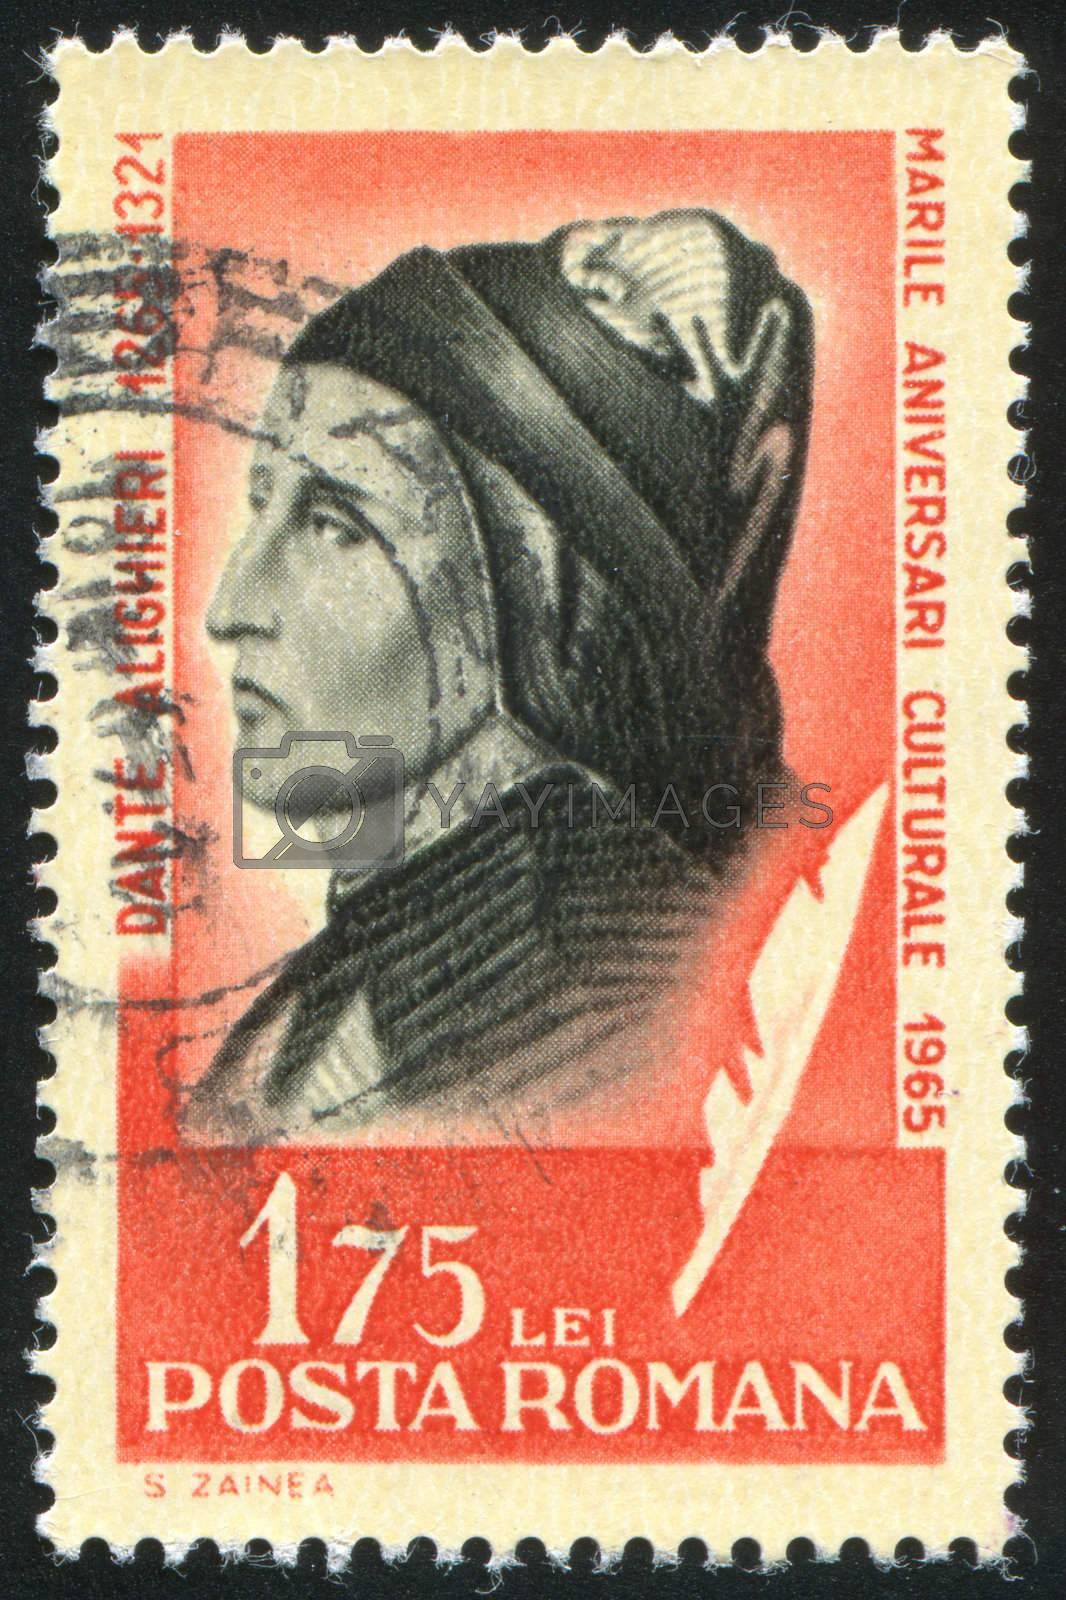 ROMANIA - CIRCA 1965: stamp printed by Romania, show Dante Alighieri, circa 1965.